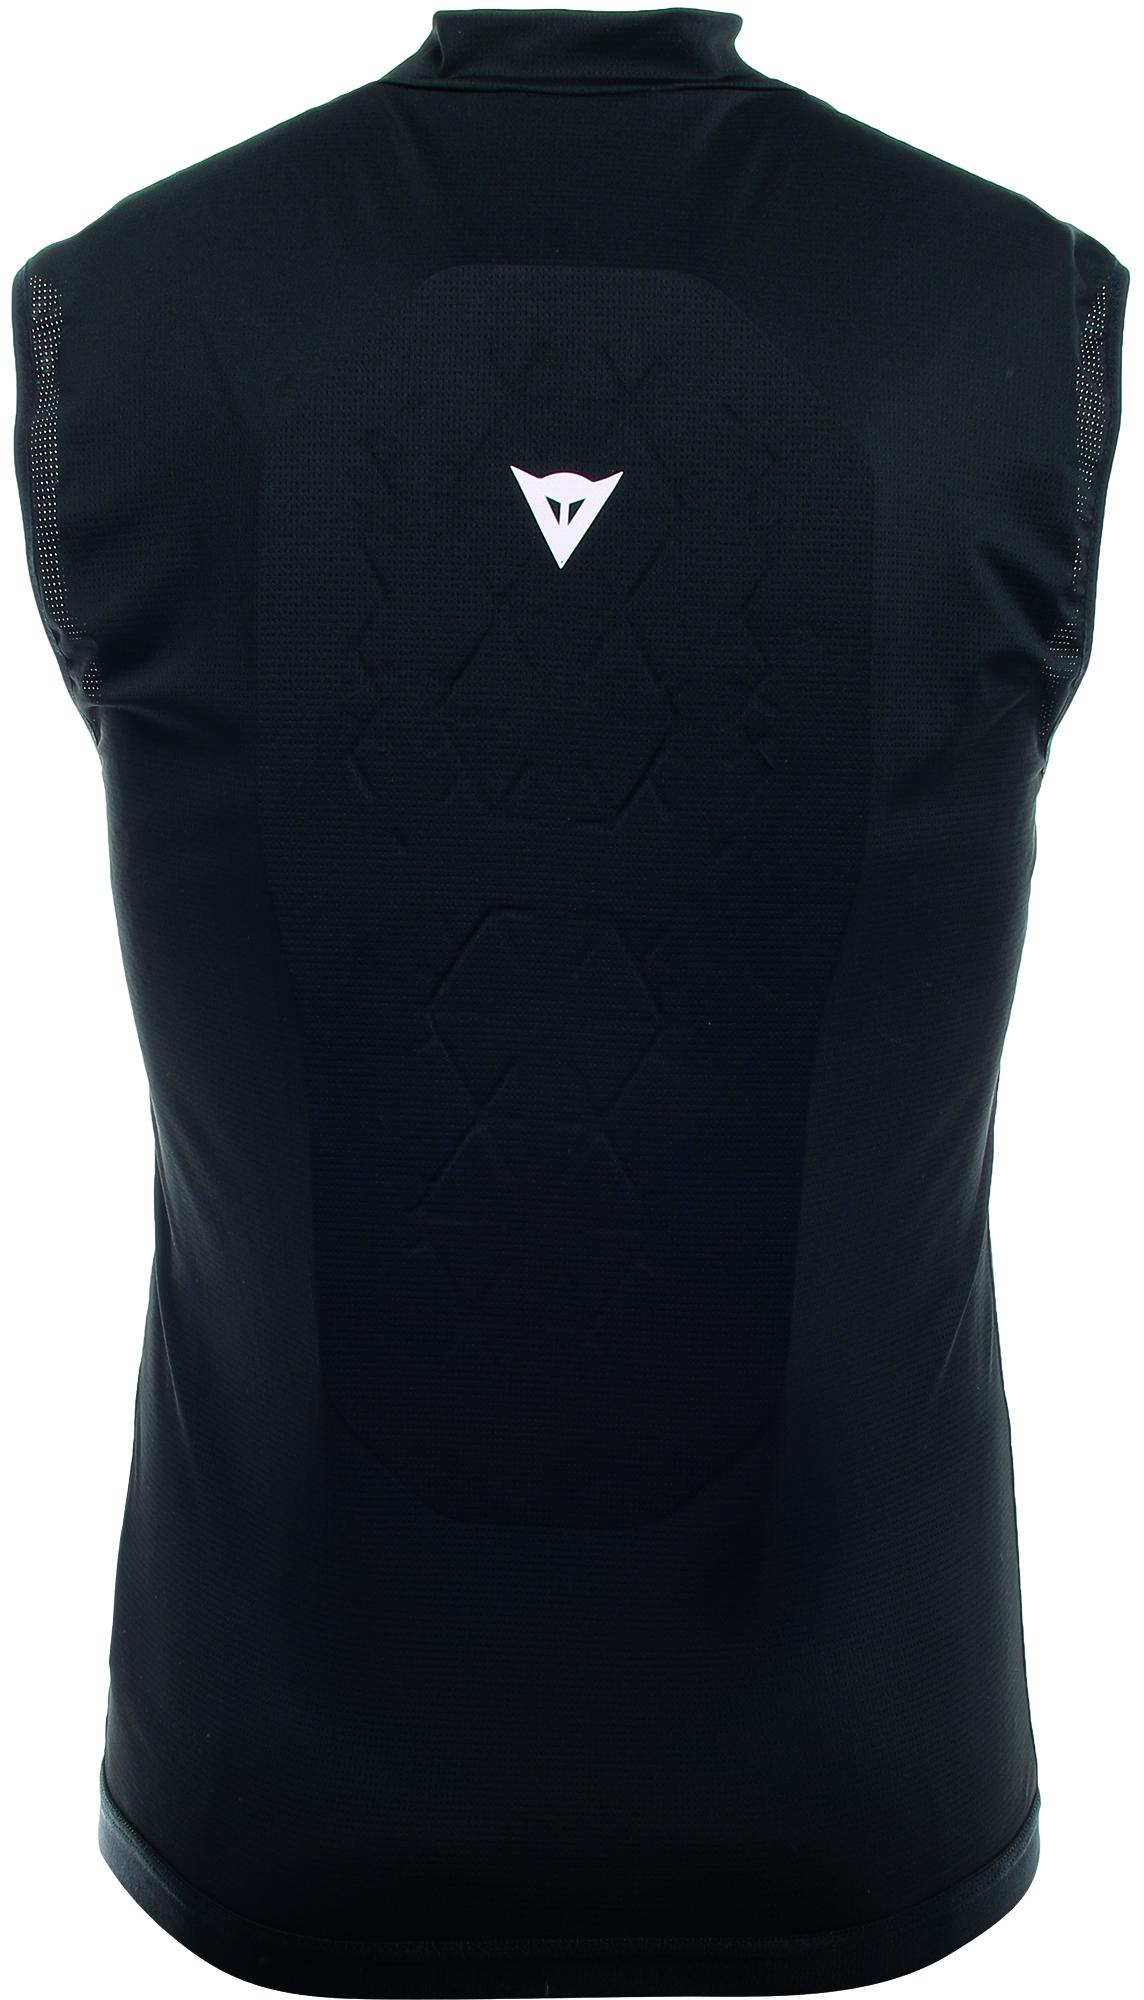 Dainese Защита торса Dainese Flexagon шорты защитные детские dainese evo